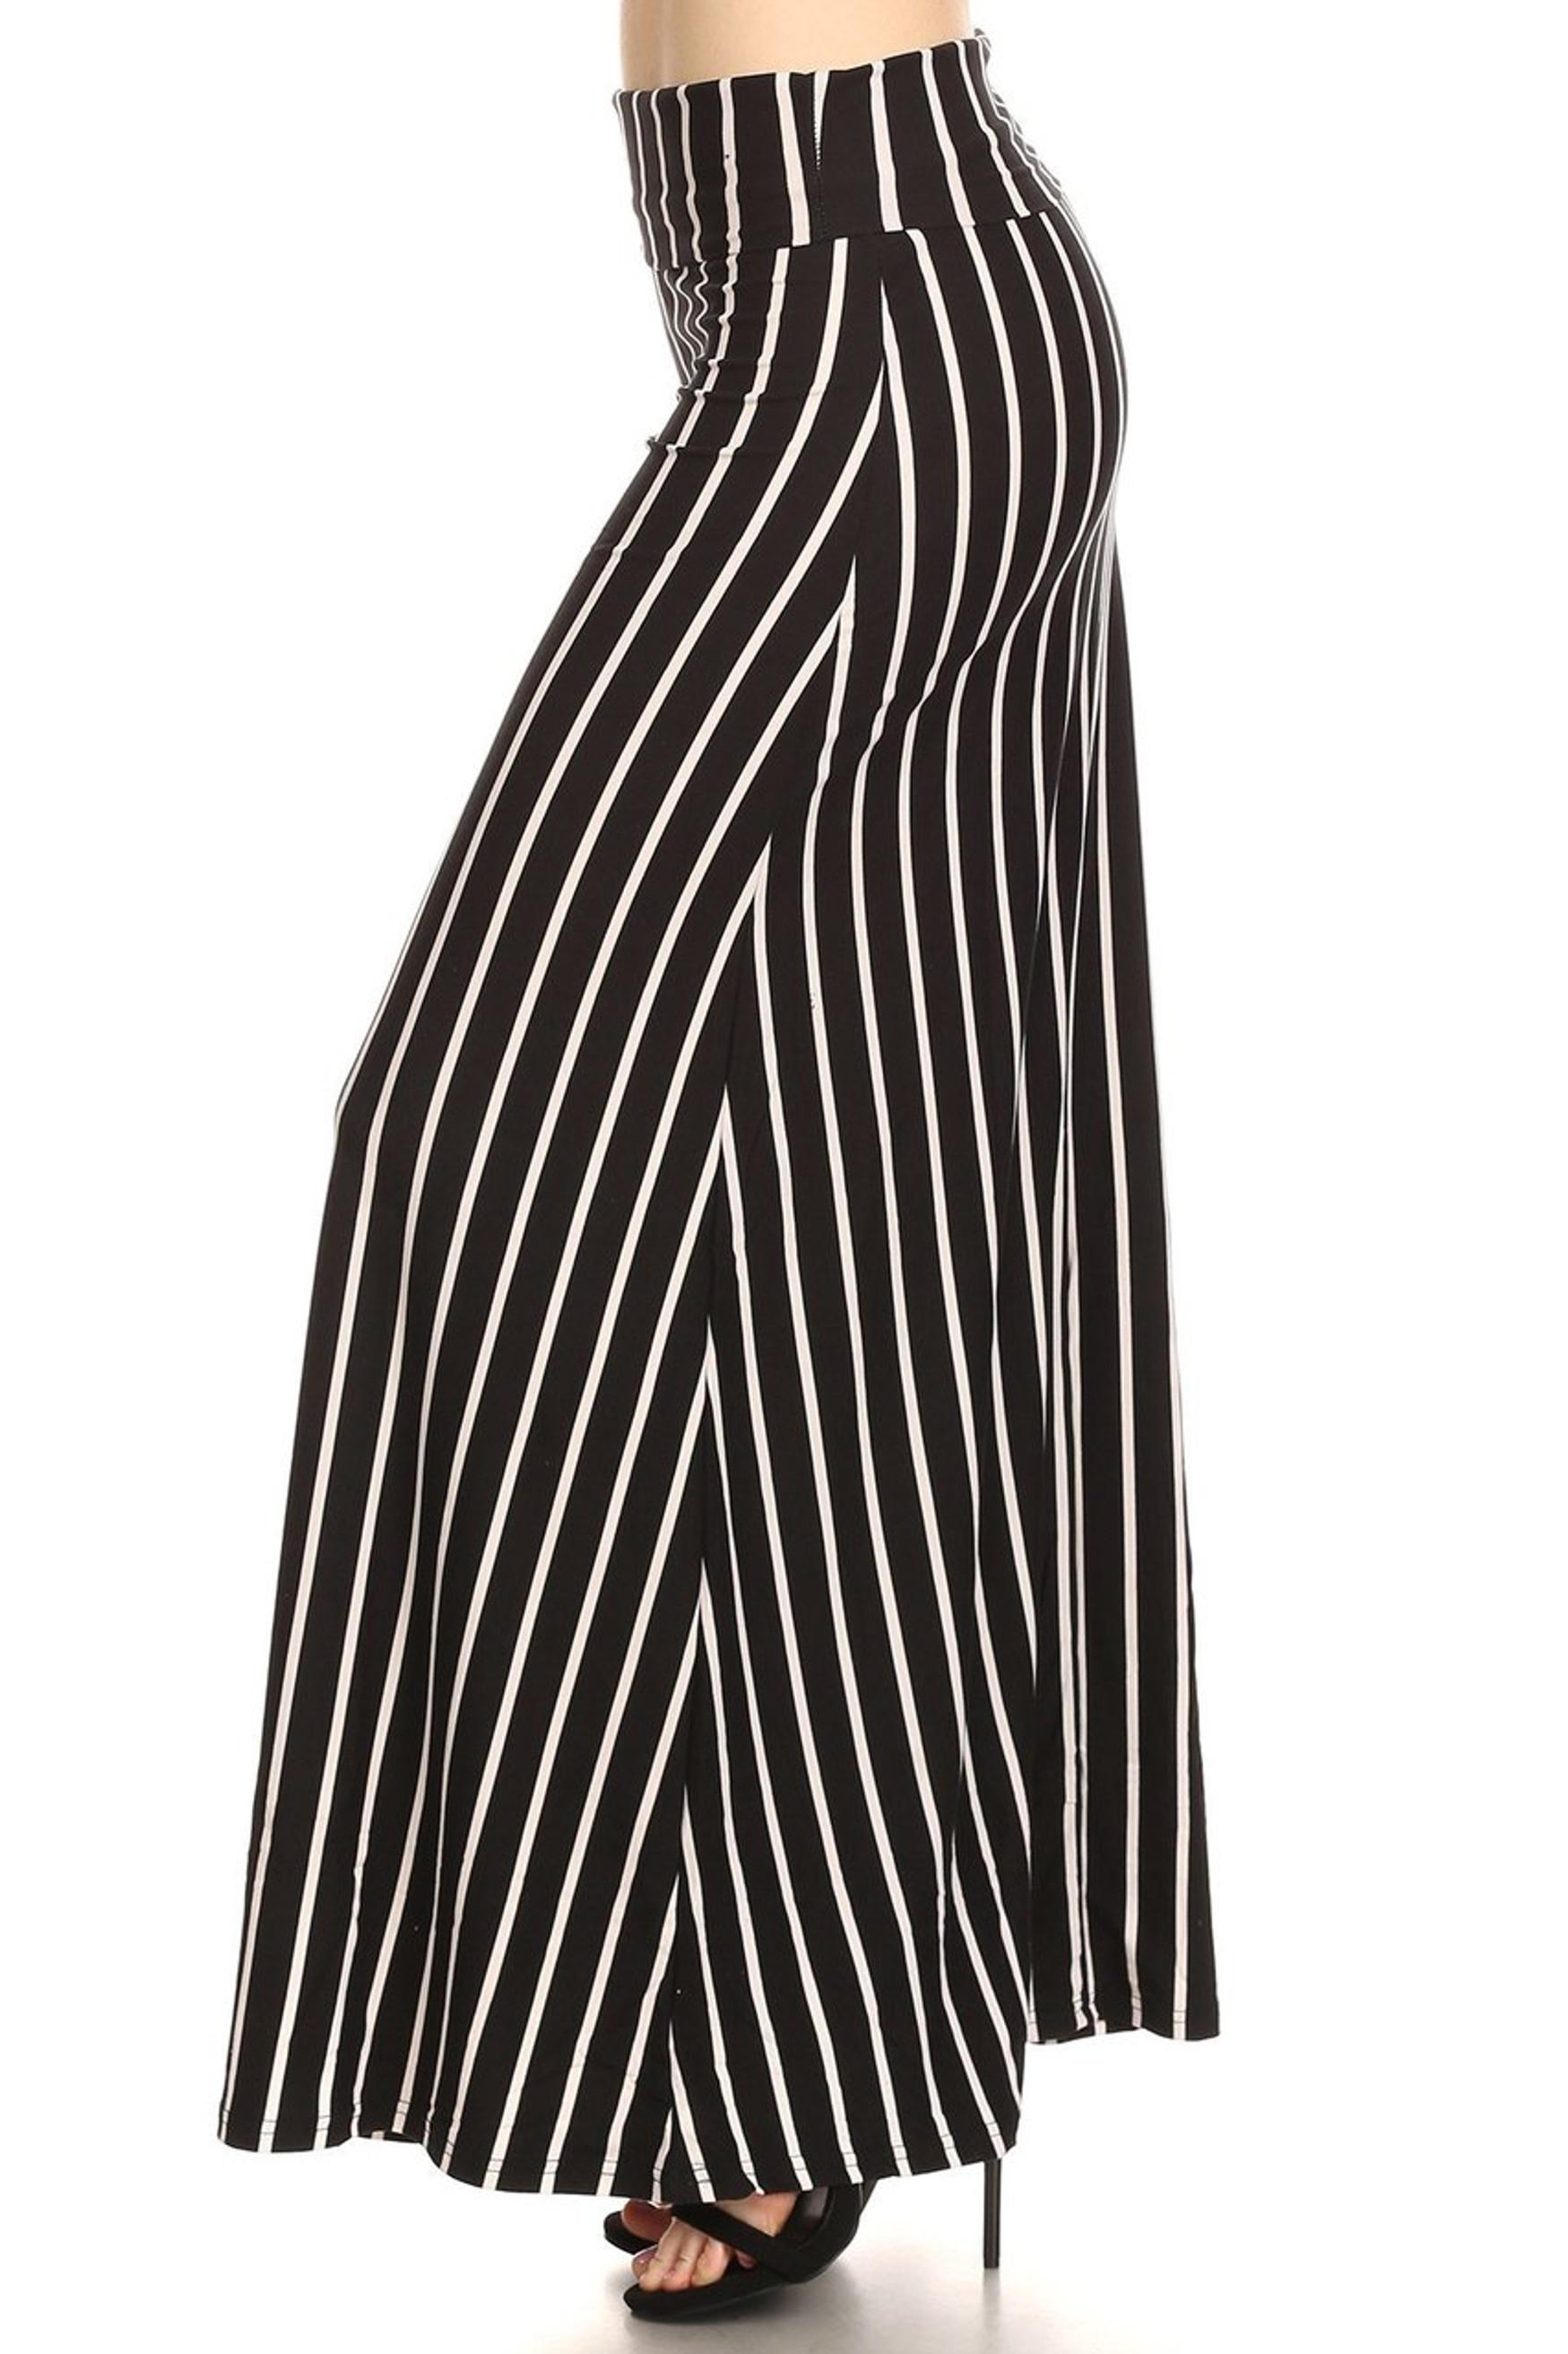 Black Pinstripe Plus Size Buttery Soft Maxi Skirt